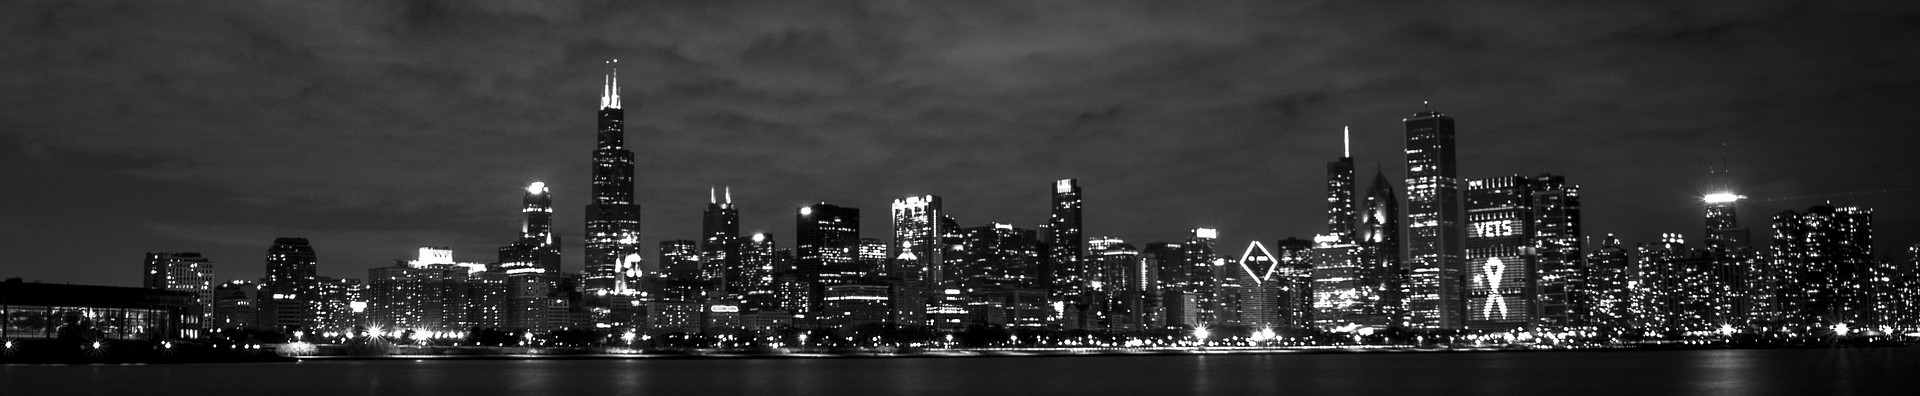 chicago-1589647_1920